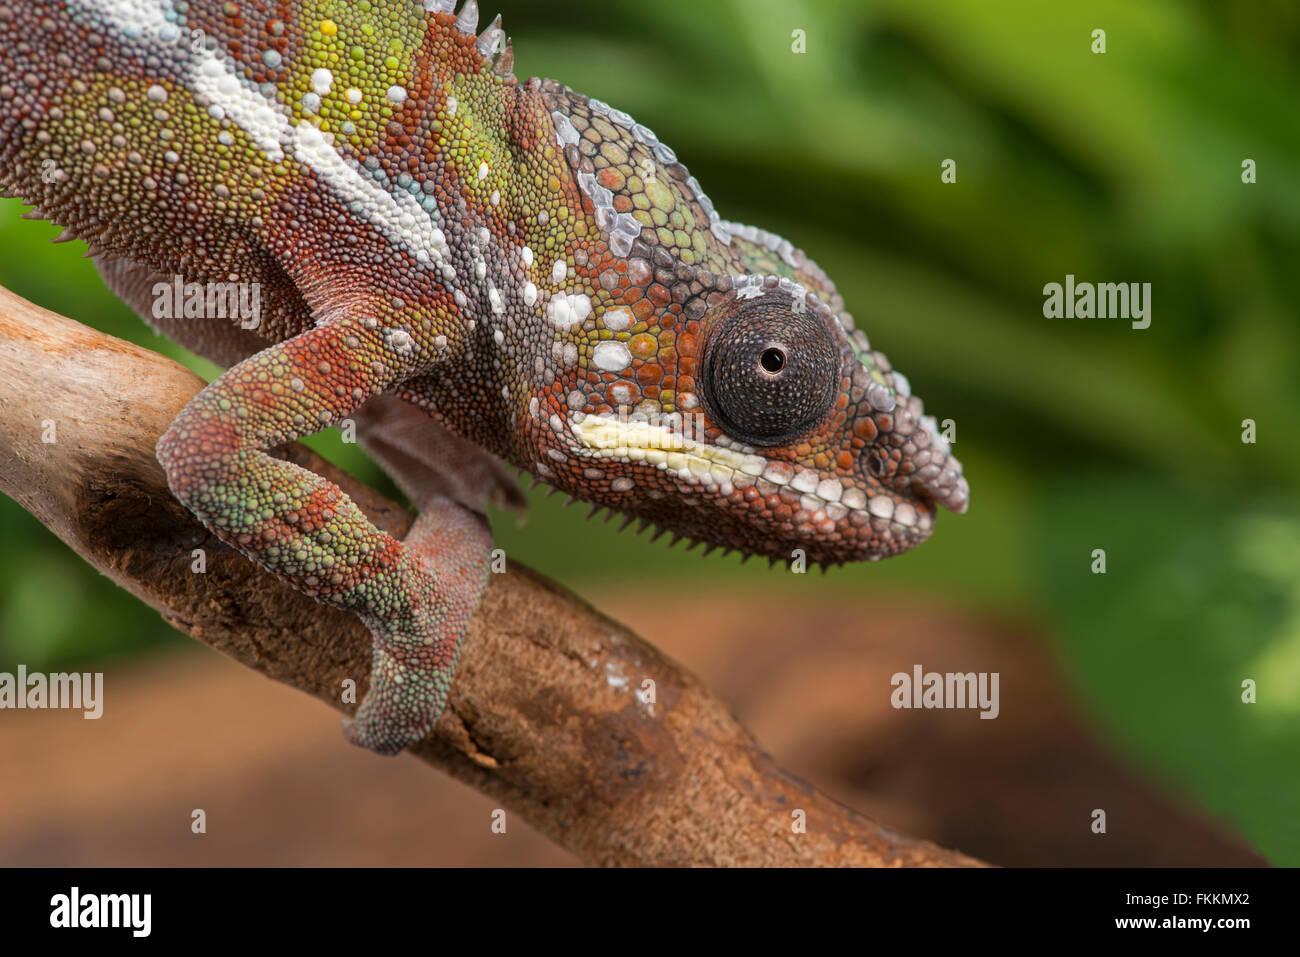 Panther Chameleon (Furcifer pardalis) Controlled, studio - Stock Image